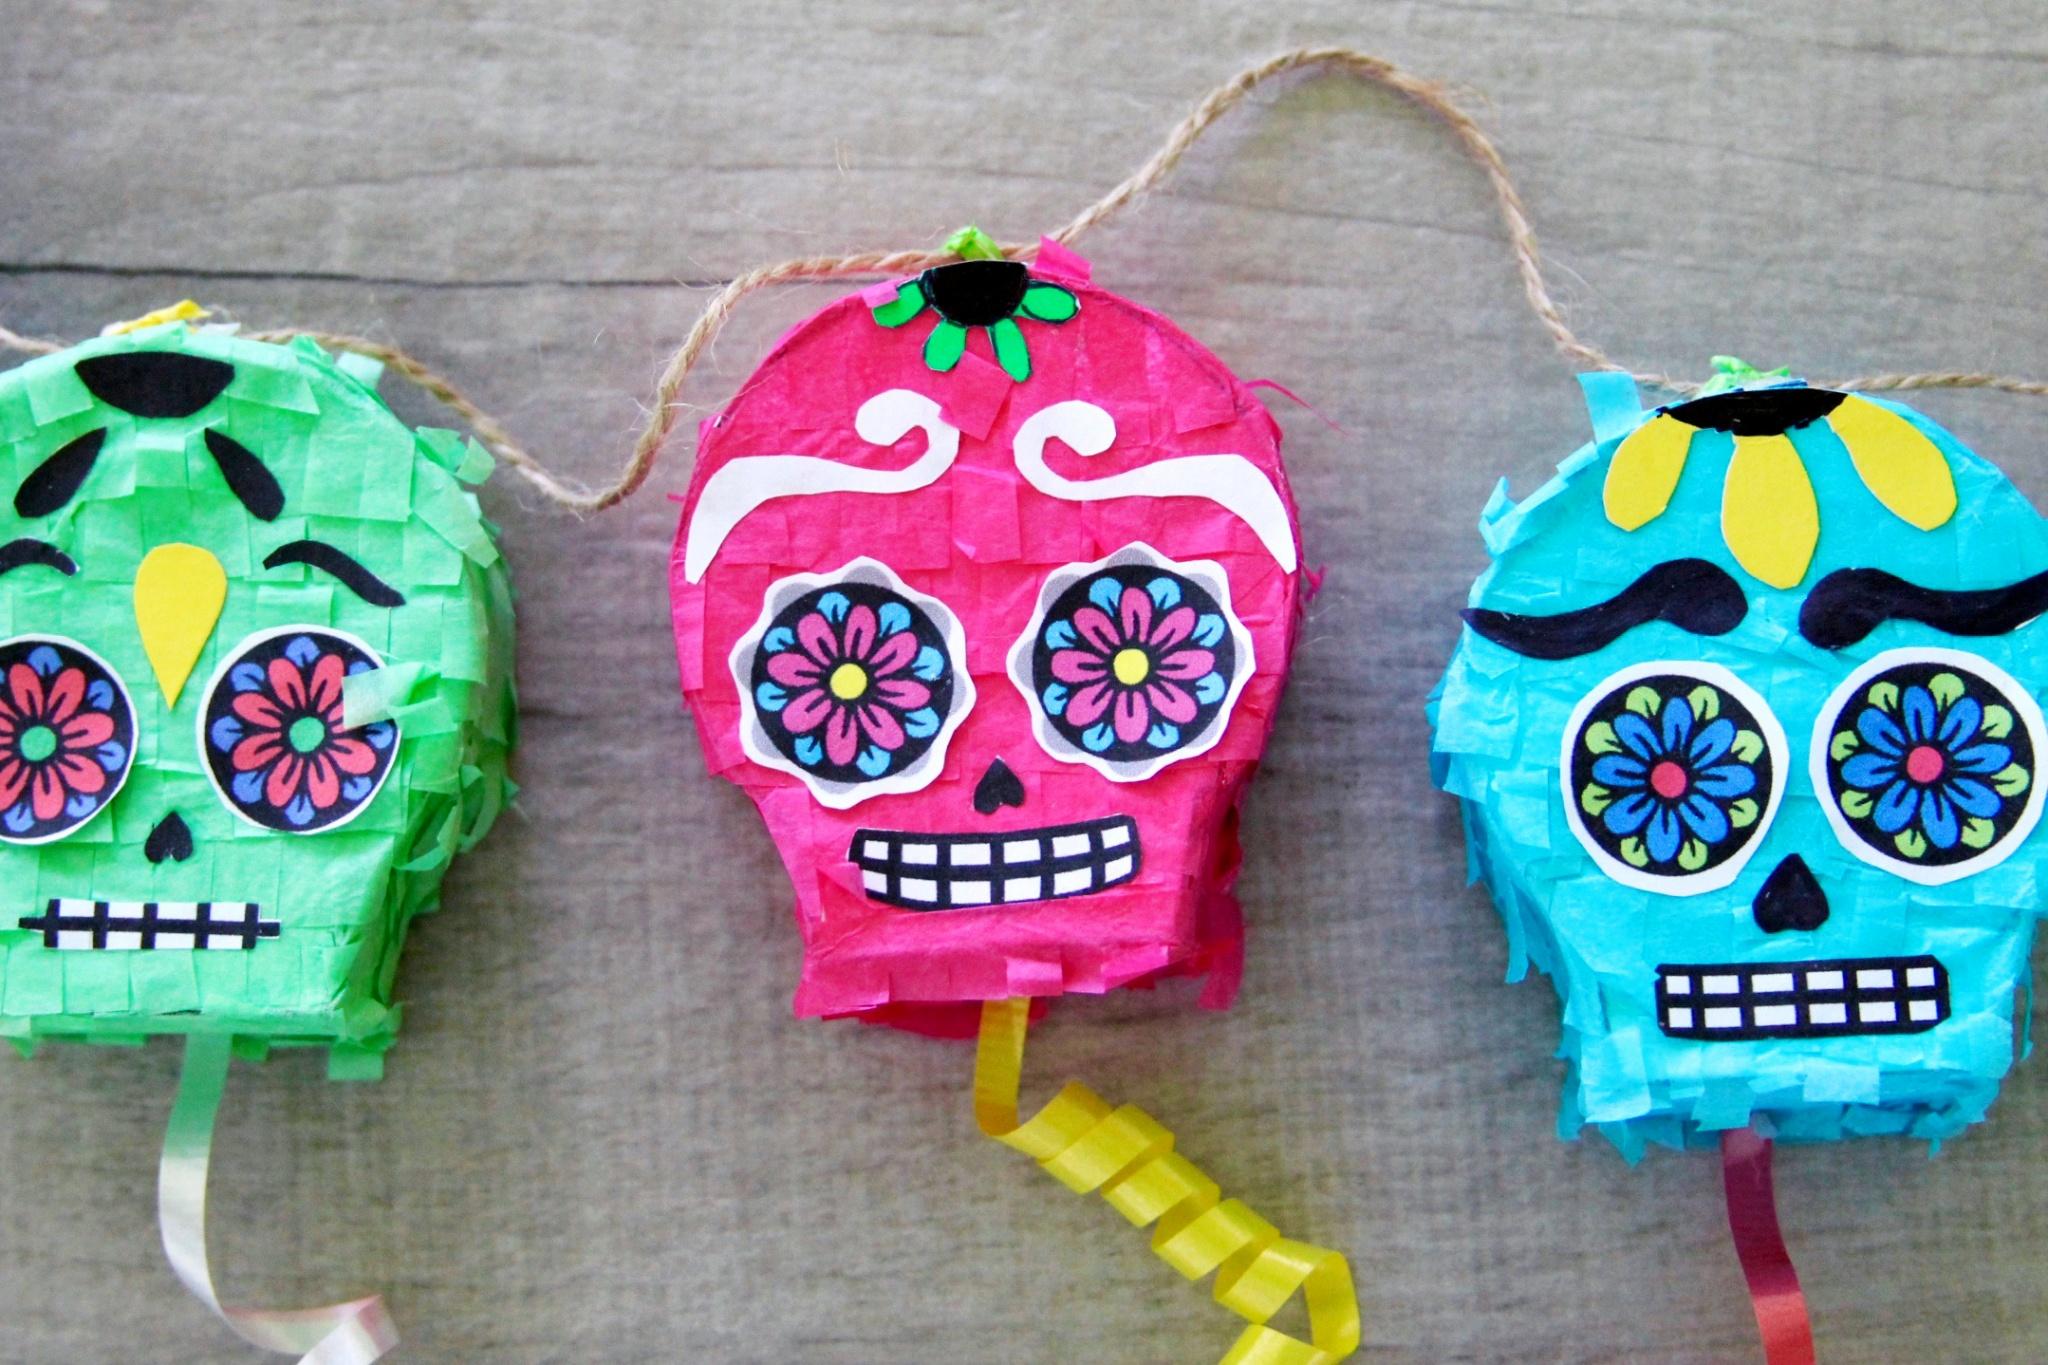 DIY Day Of The Dead Sugar Skull Piñata Garland - Growing Up Bilingual